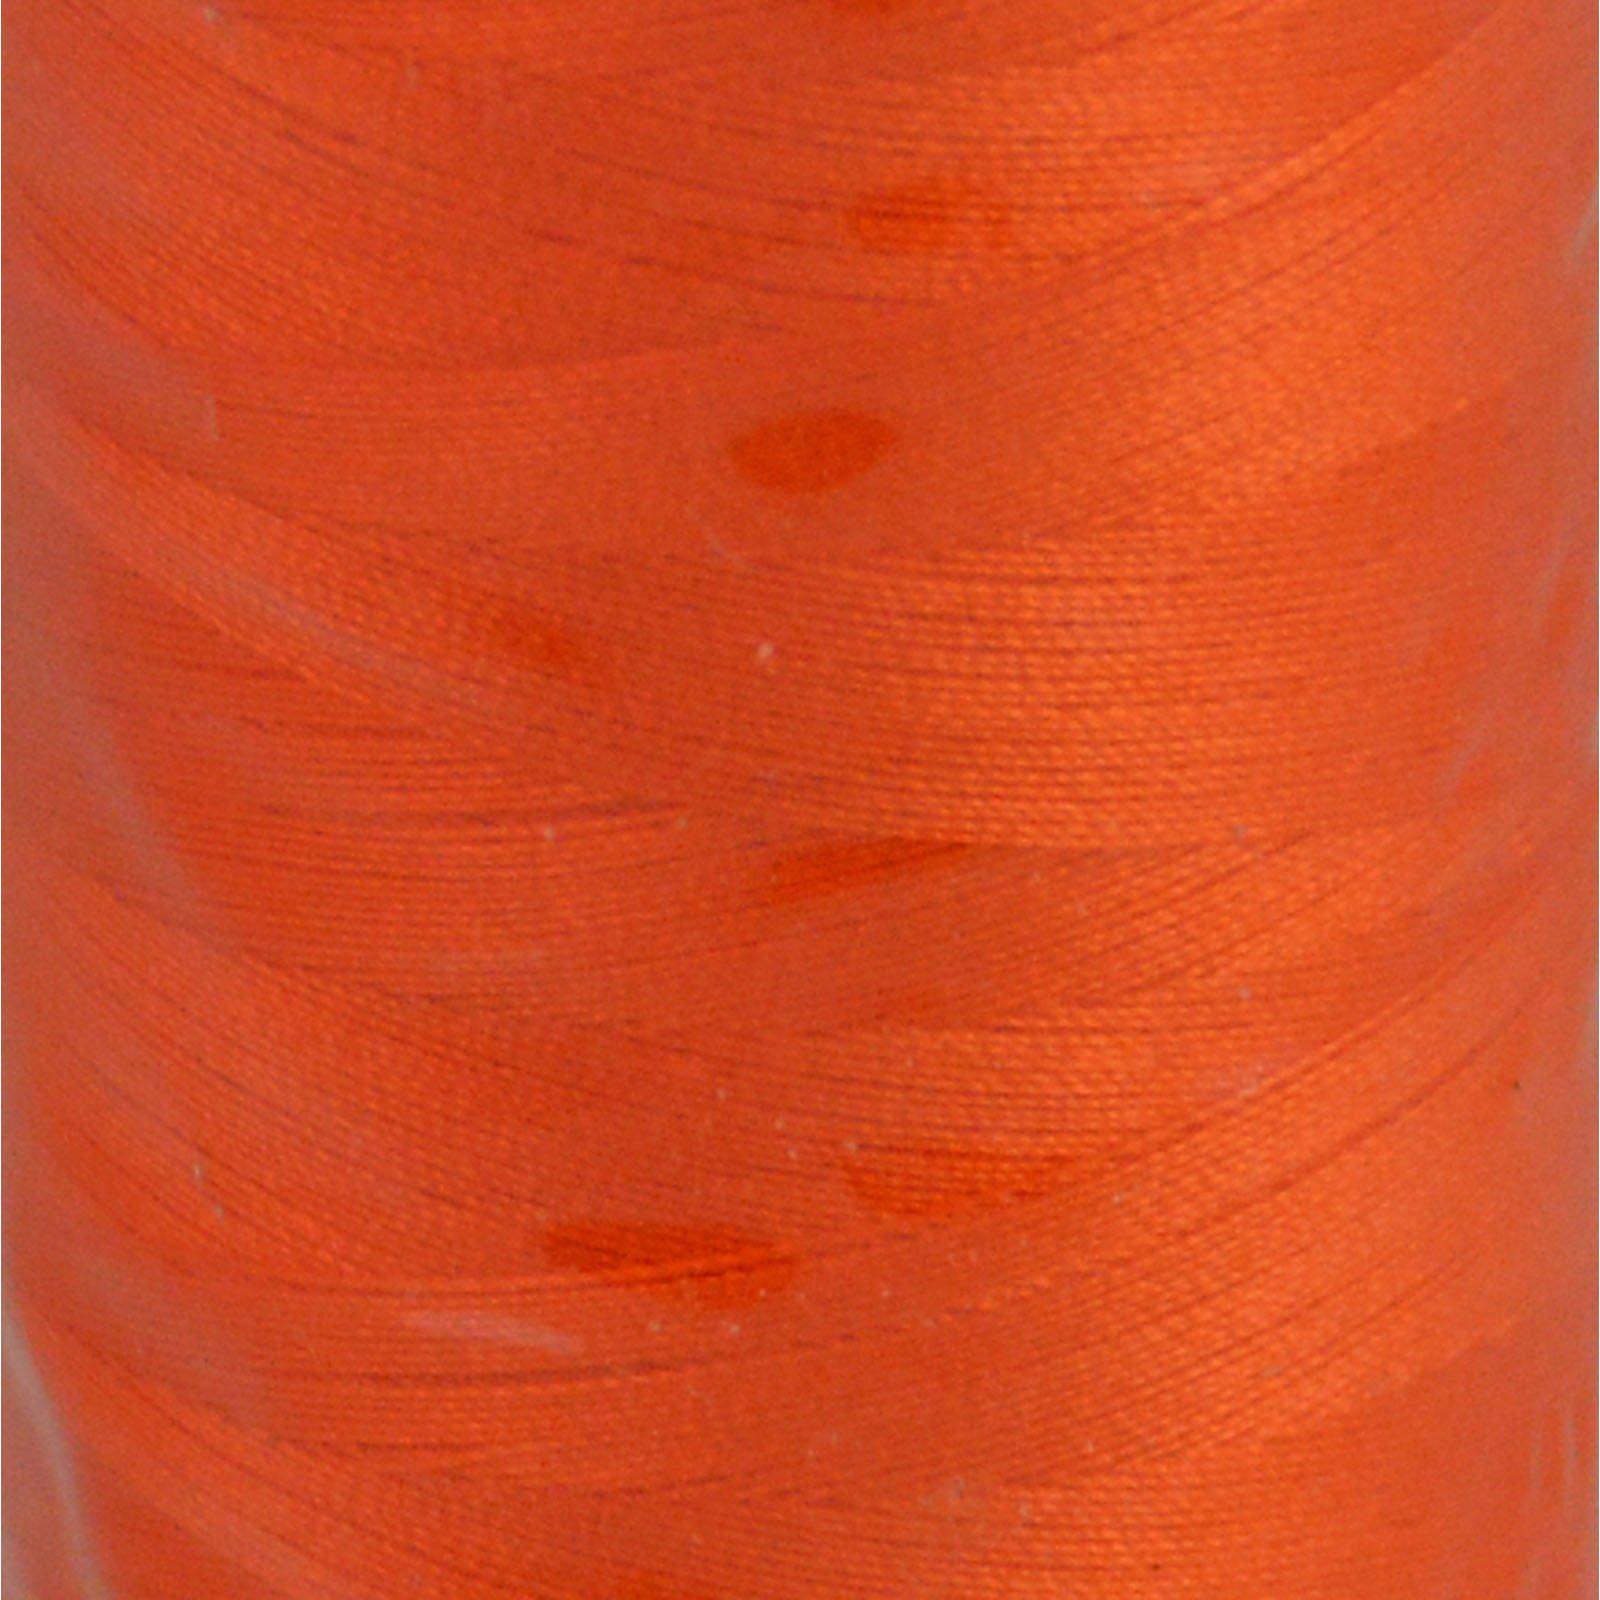 # 1104 Neon Orange